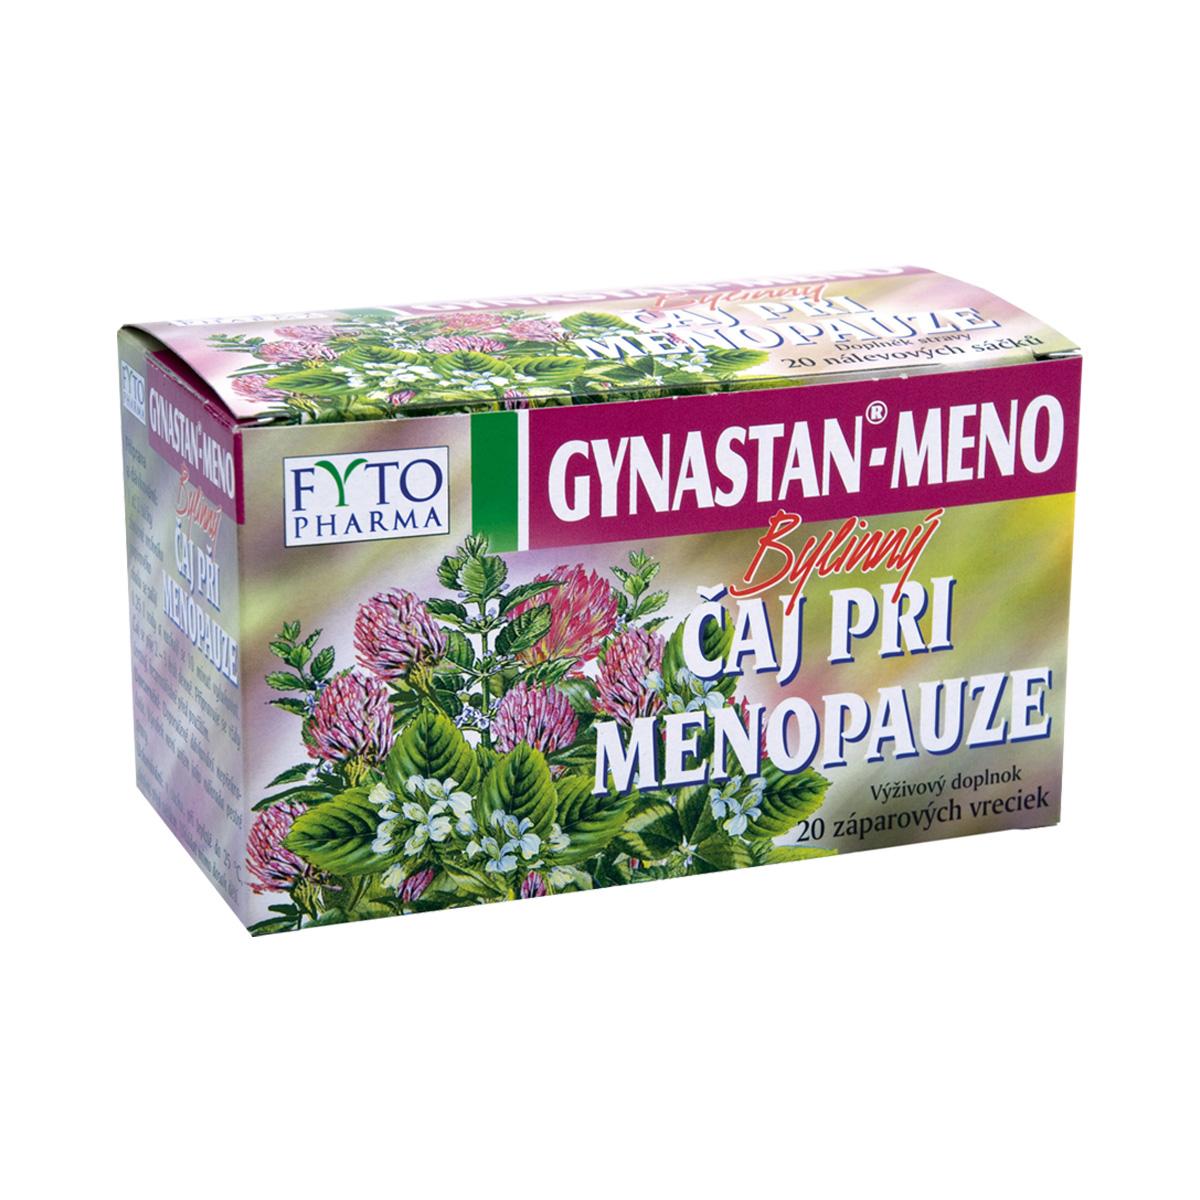 Fytopharma GYNASTAN® MENO bylinný čaj při menopauze 20 x 1,5 g